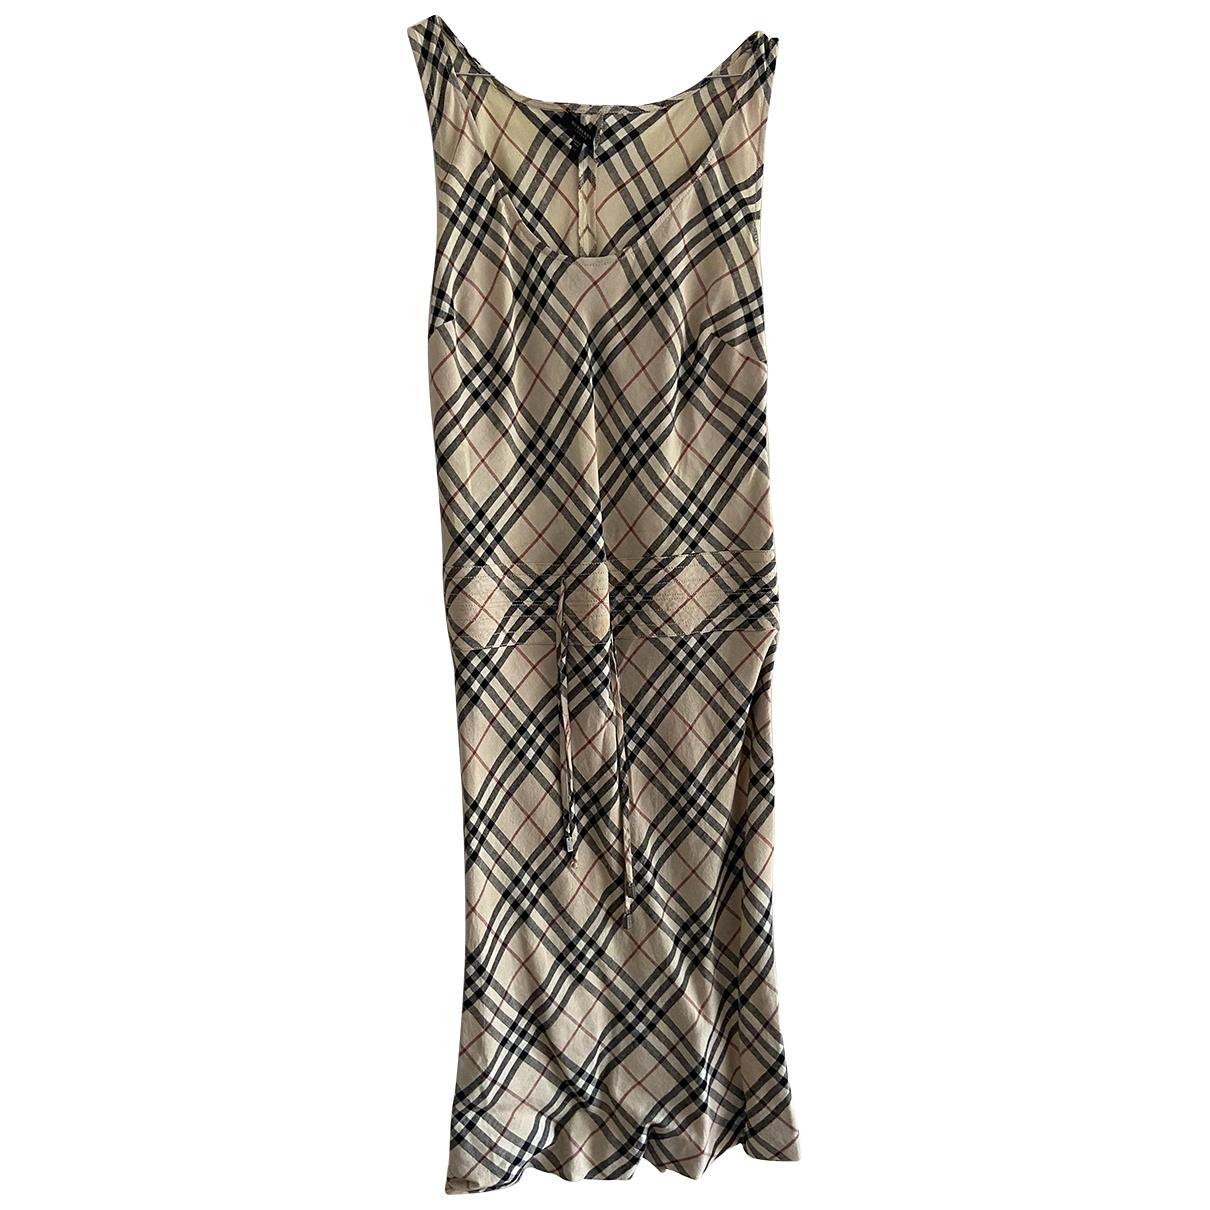 Burberry \N Kleid in  Beige Leinen